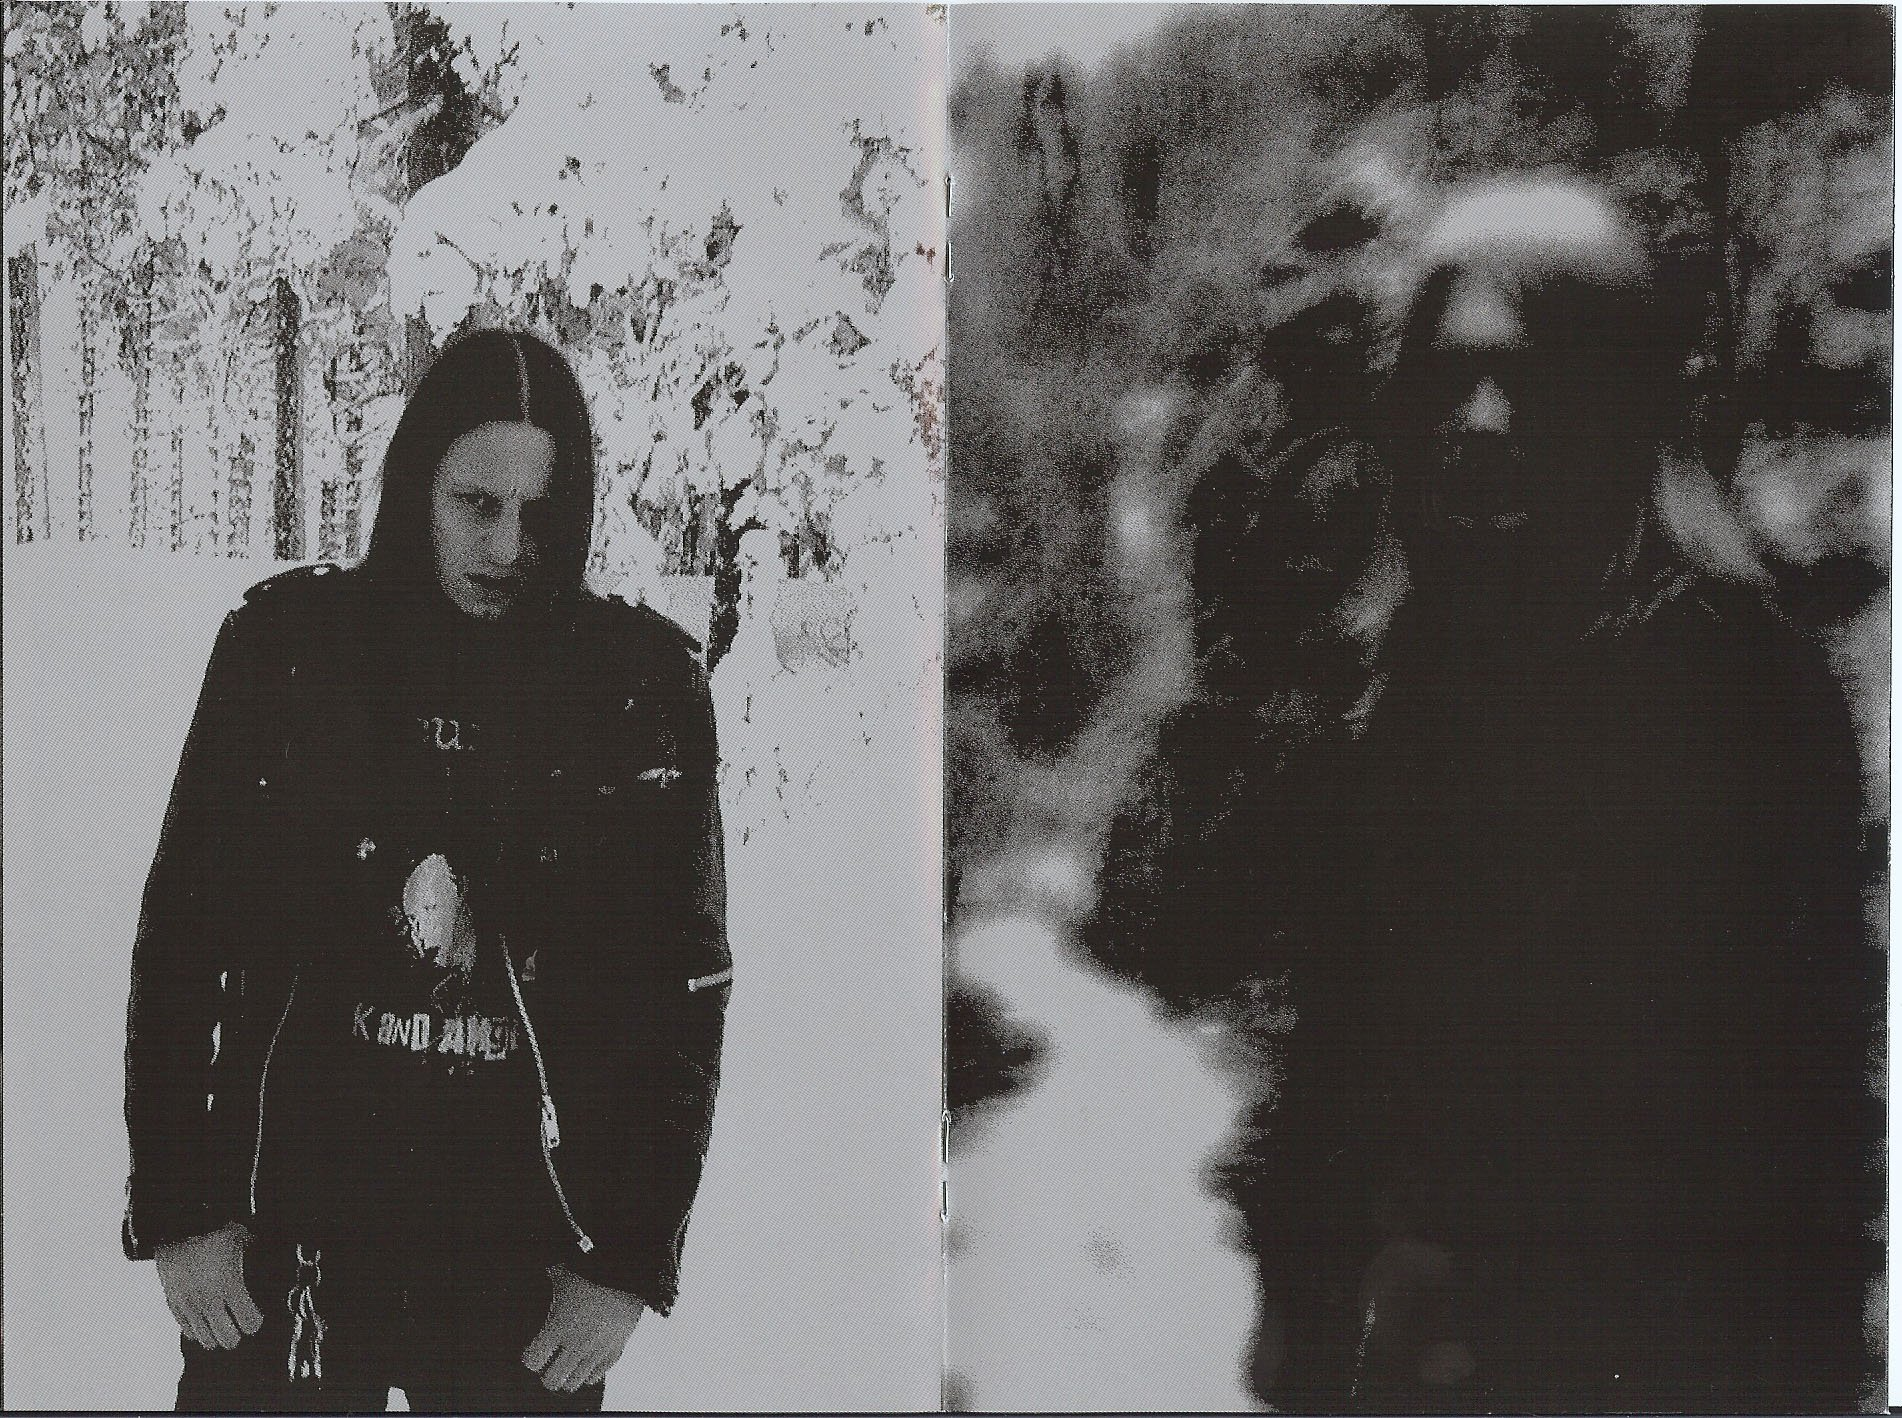 Dark Throne Song Lyrics